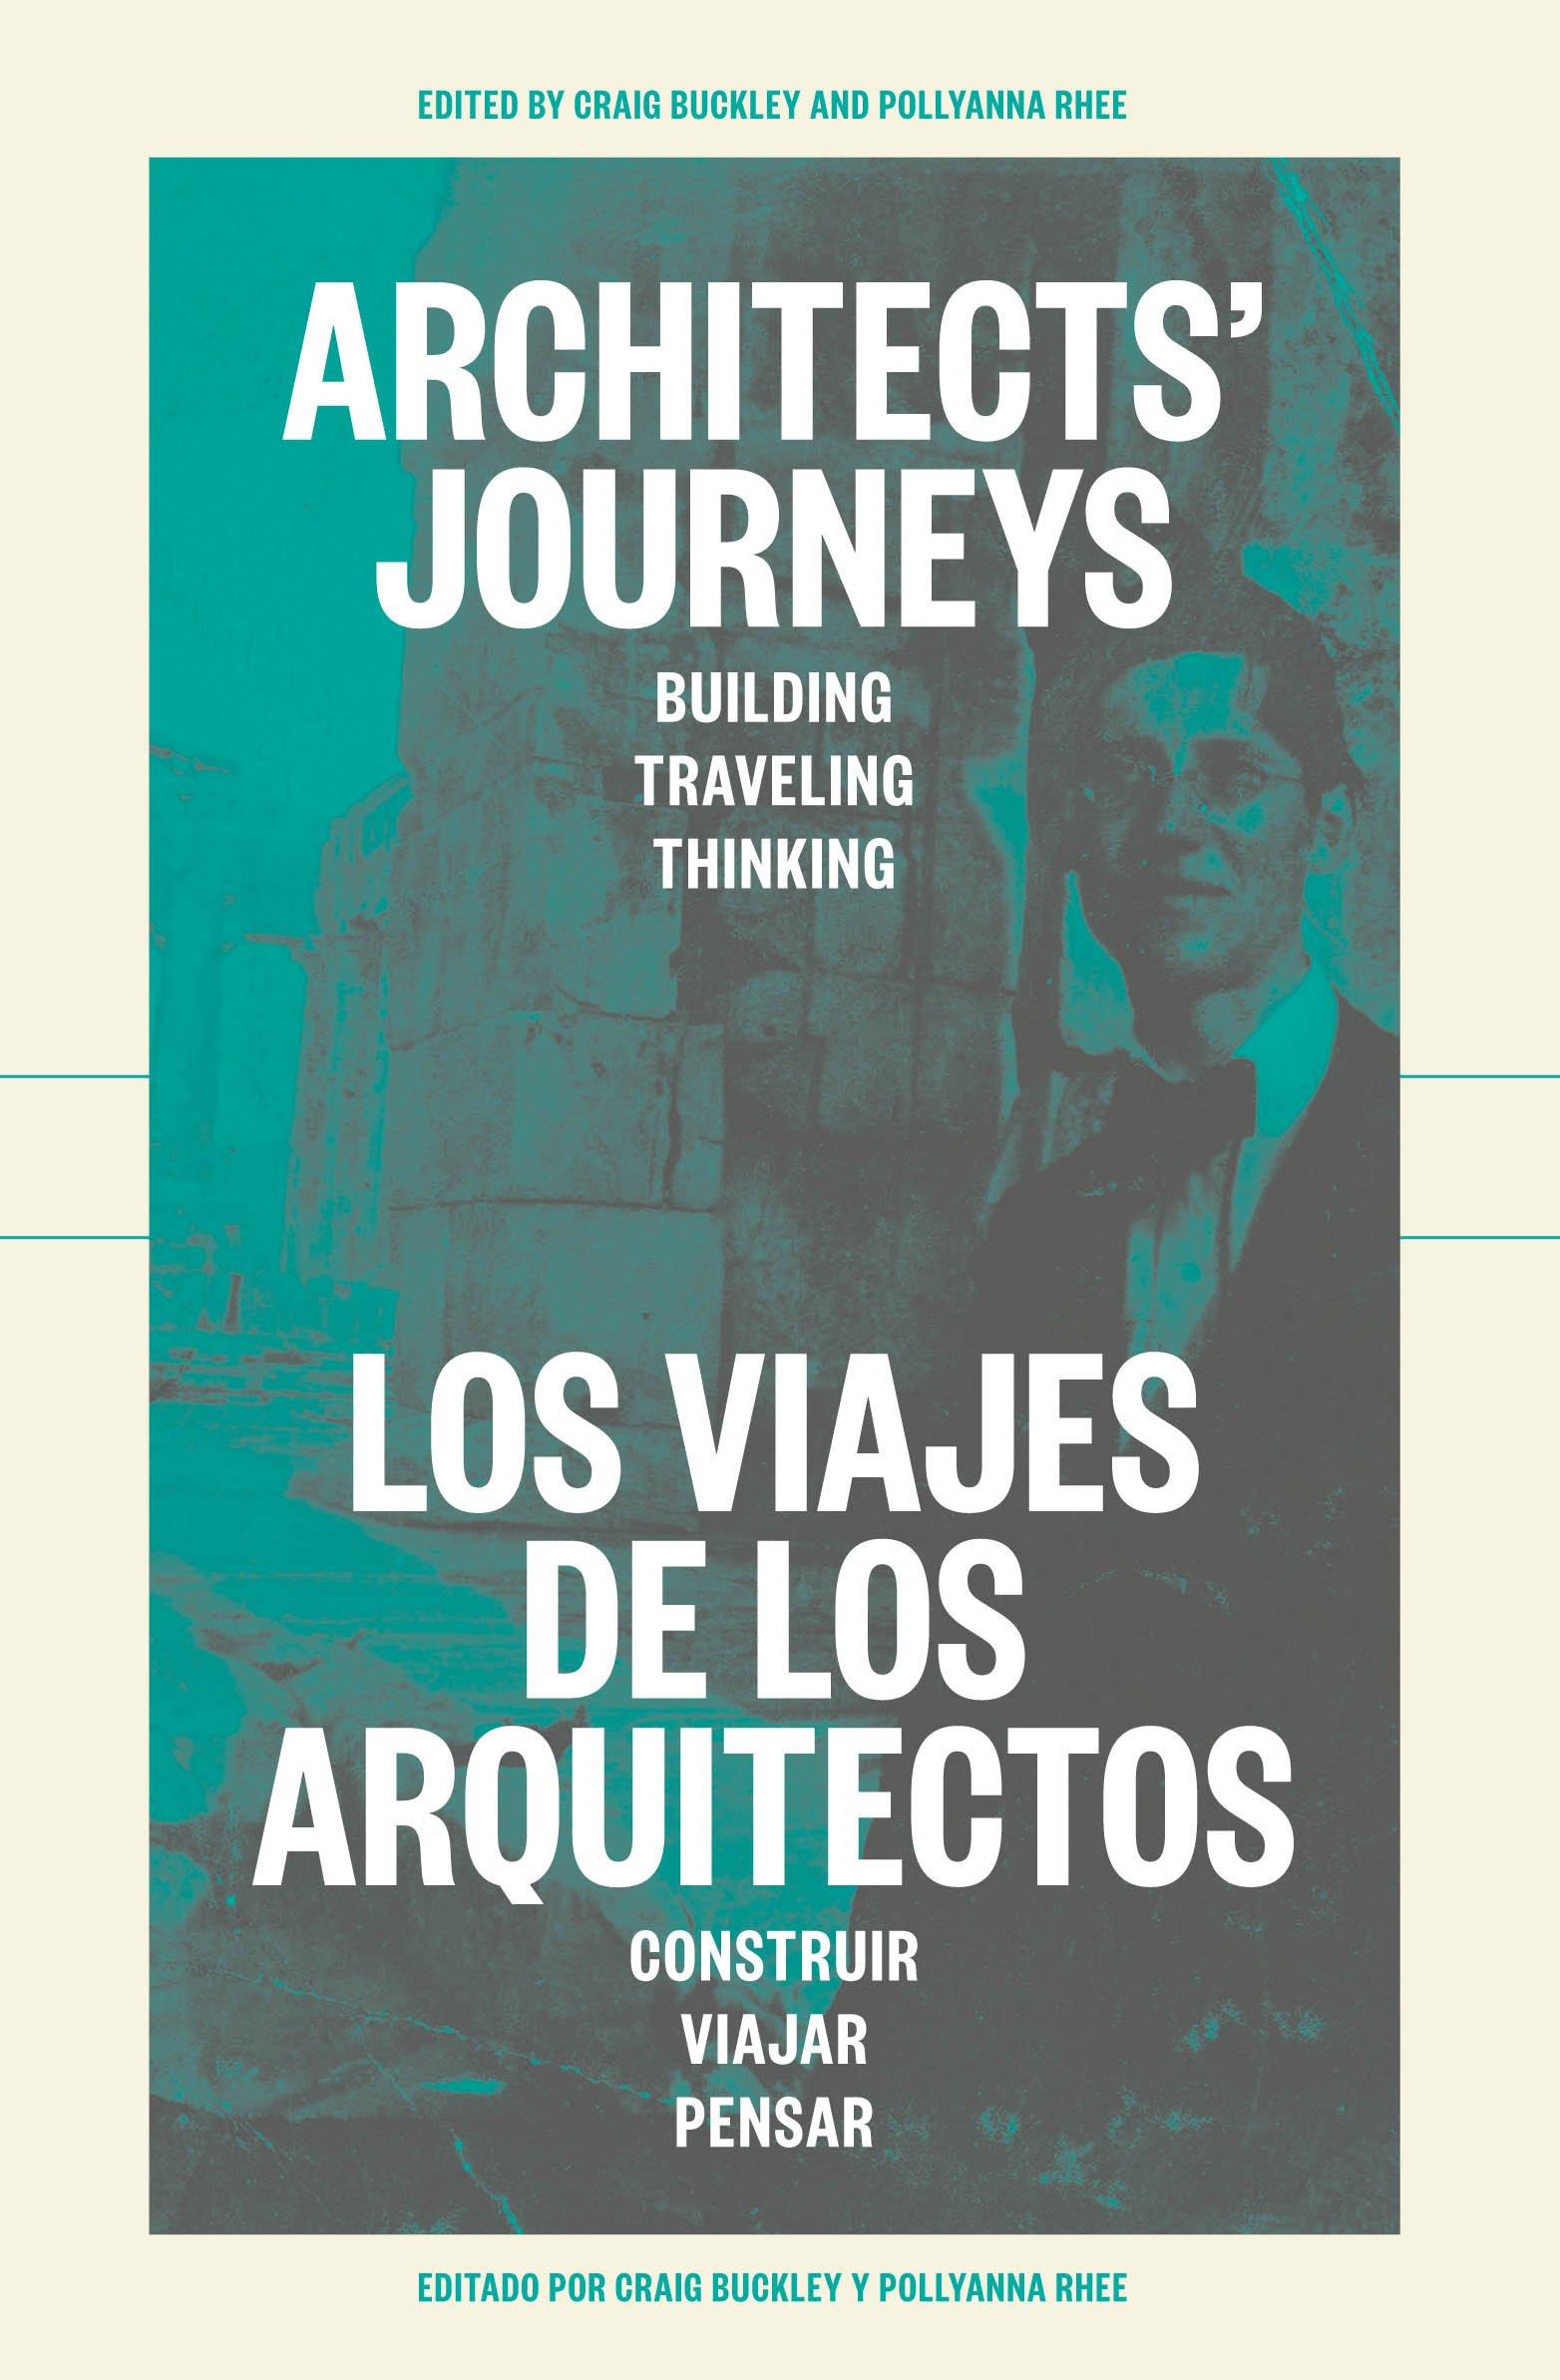 Architects' Journeys: Building Traveling Thinking